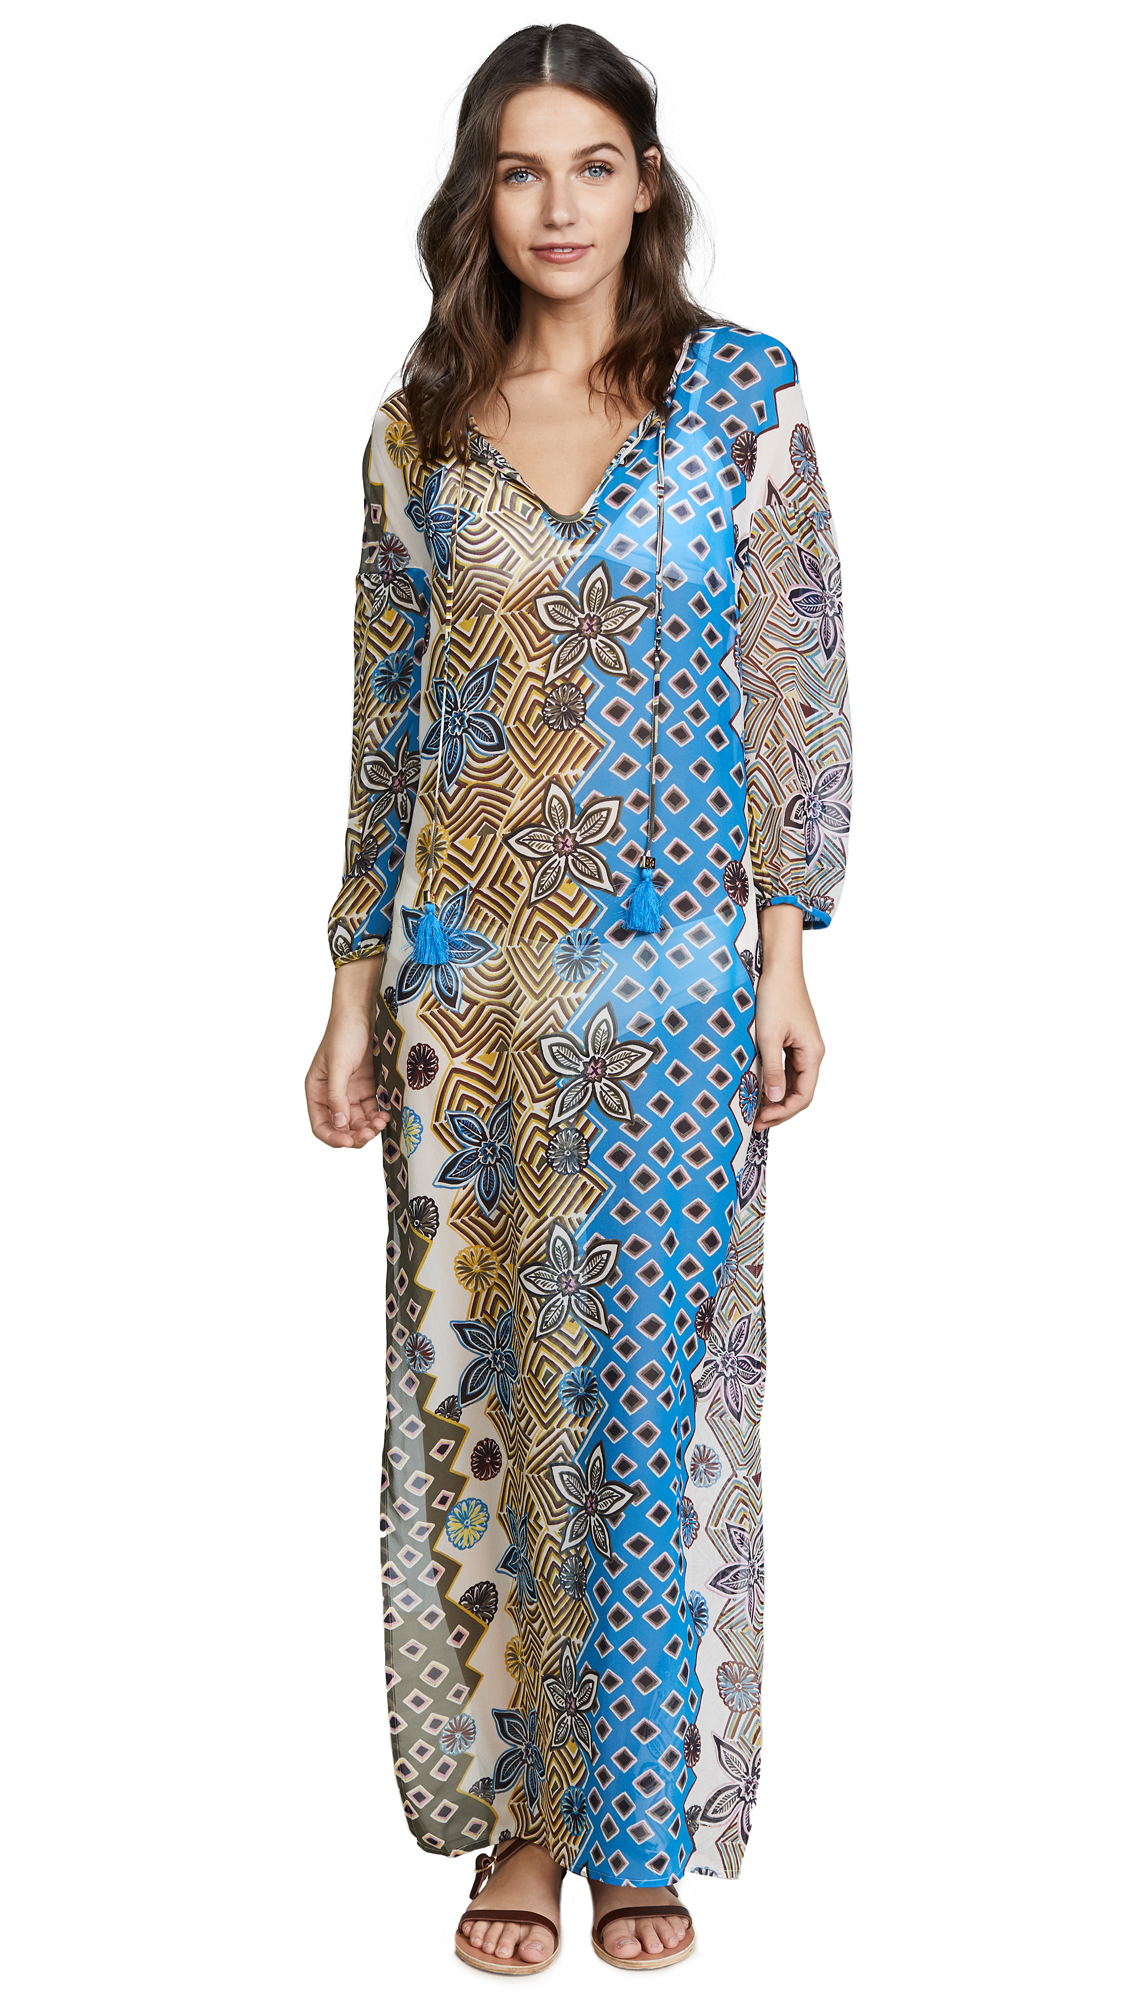 Tory Burch Jasmine Floral Long Caftan - Jasmine Floral Print